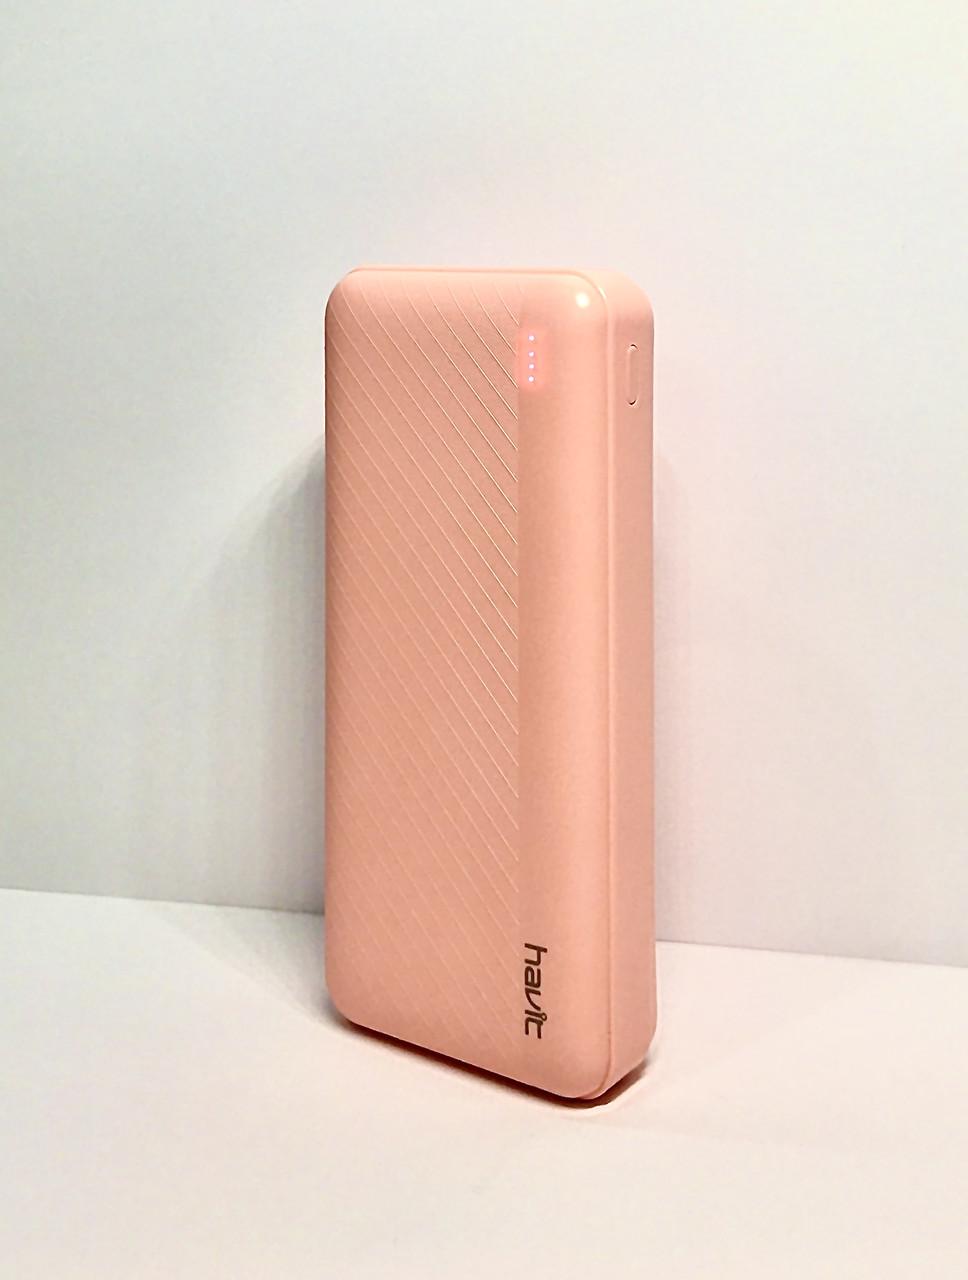 Портативное зарядное устройство Havit  HV-H584, 10000 mAh Pink